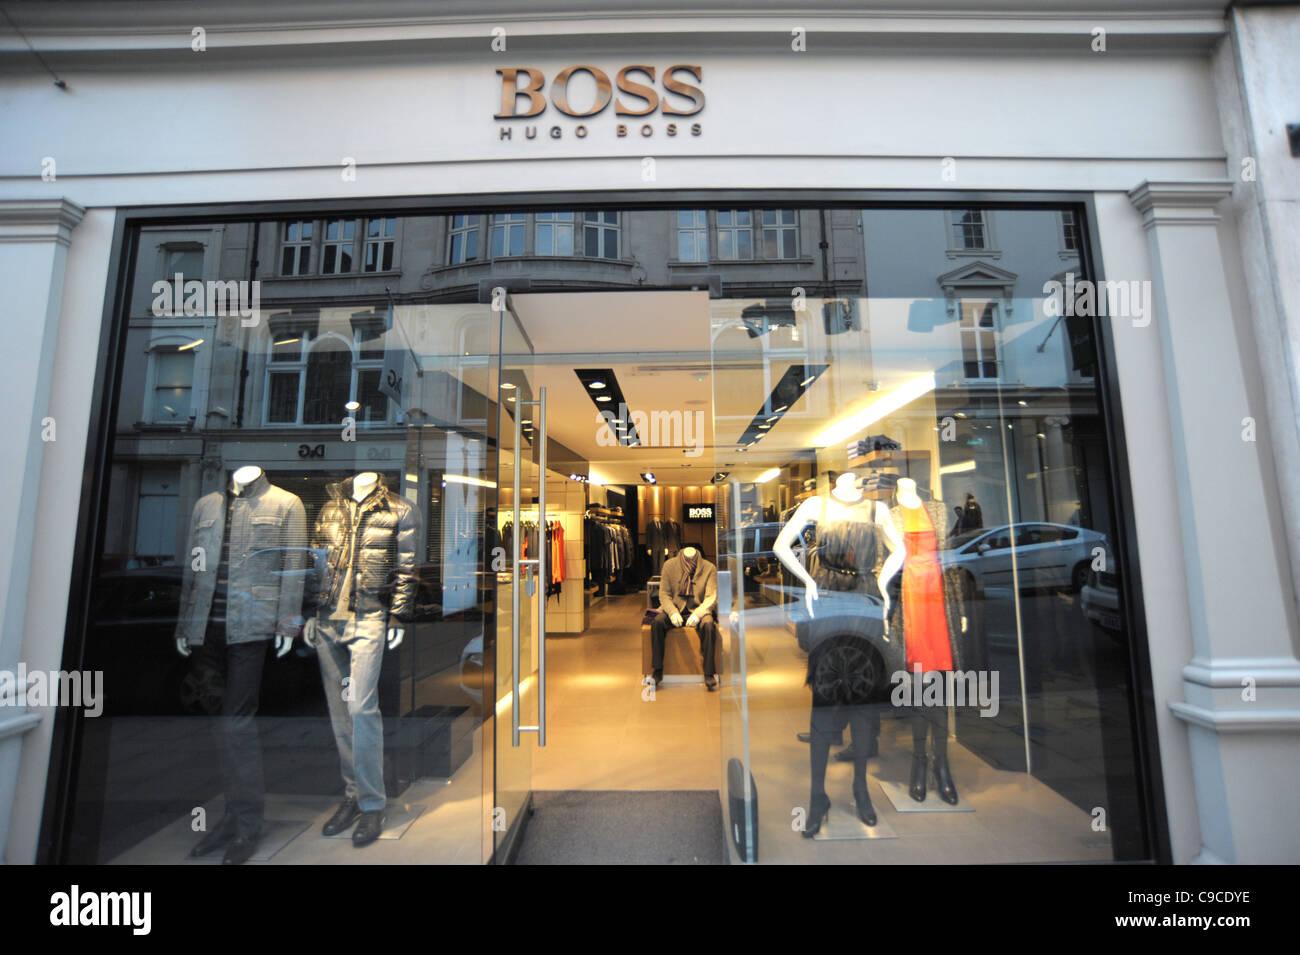 hugo boss store stock photos hugo boss store stock. Black Bedroom Furniture Sets. Home Design Ideas